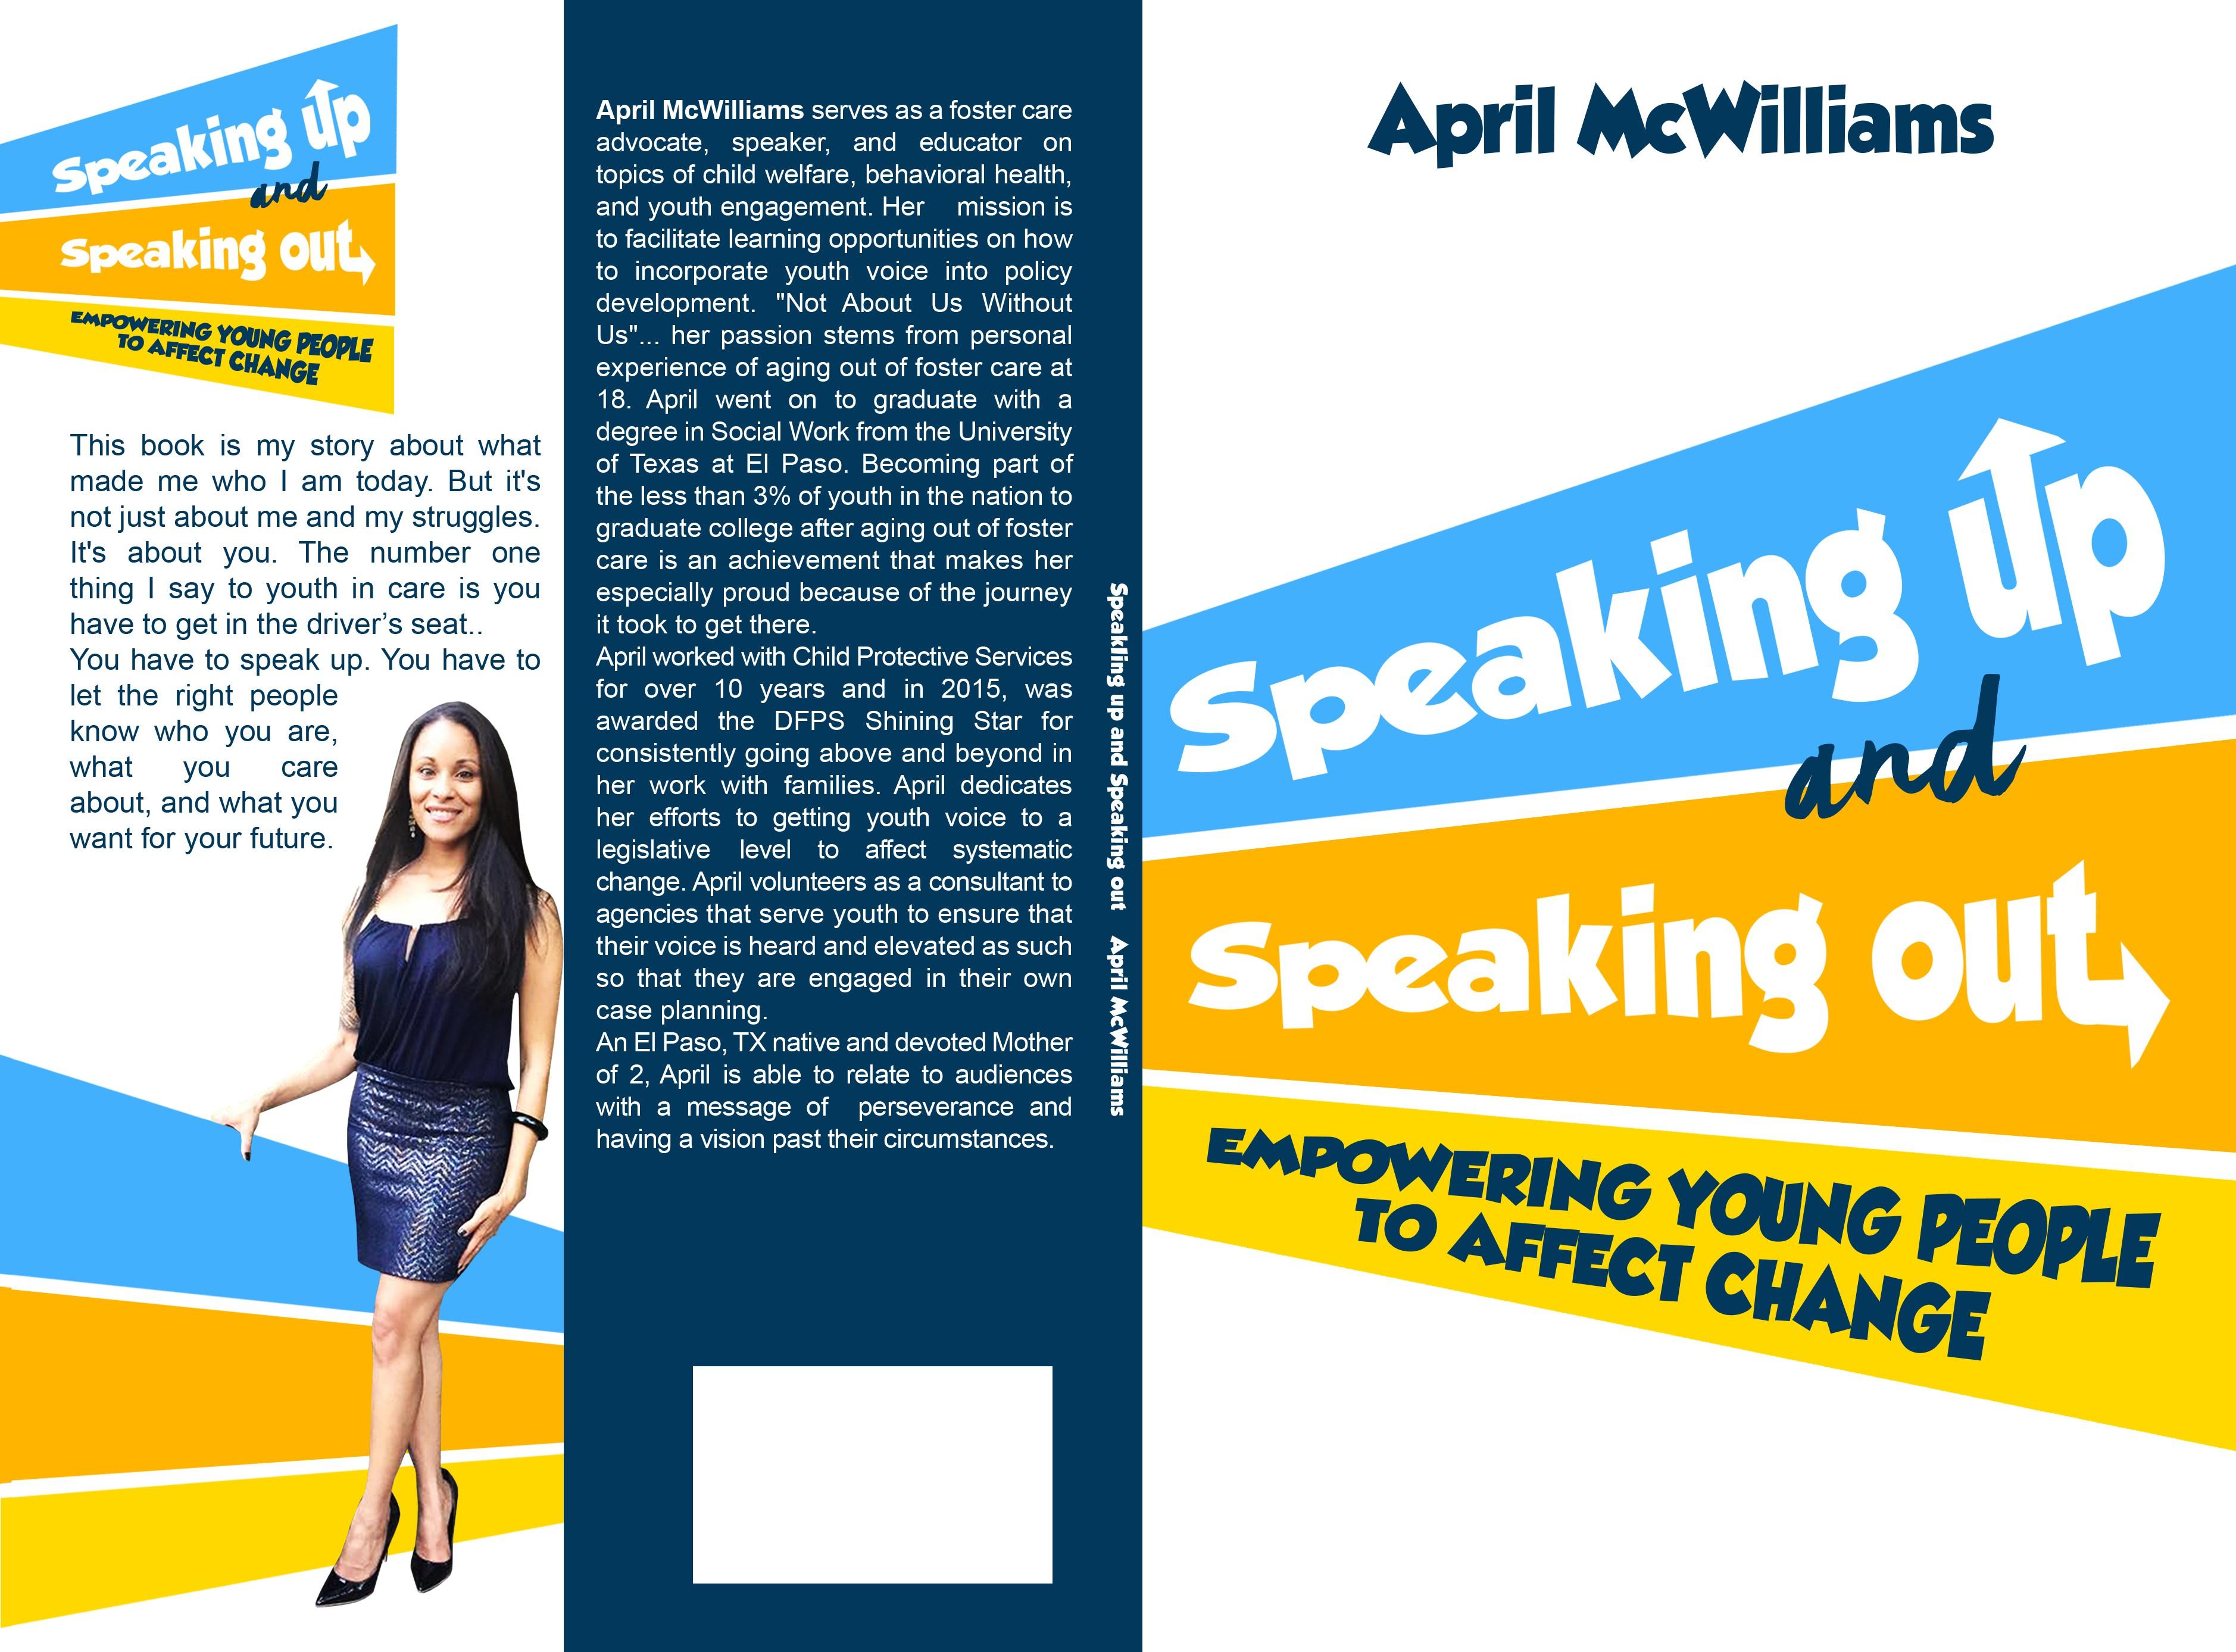 Speaking Up Motivational Book!